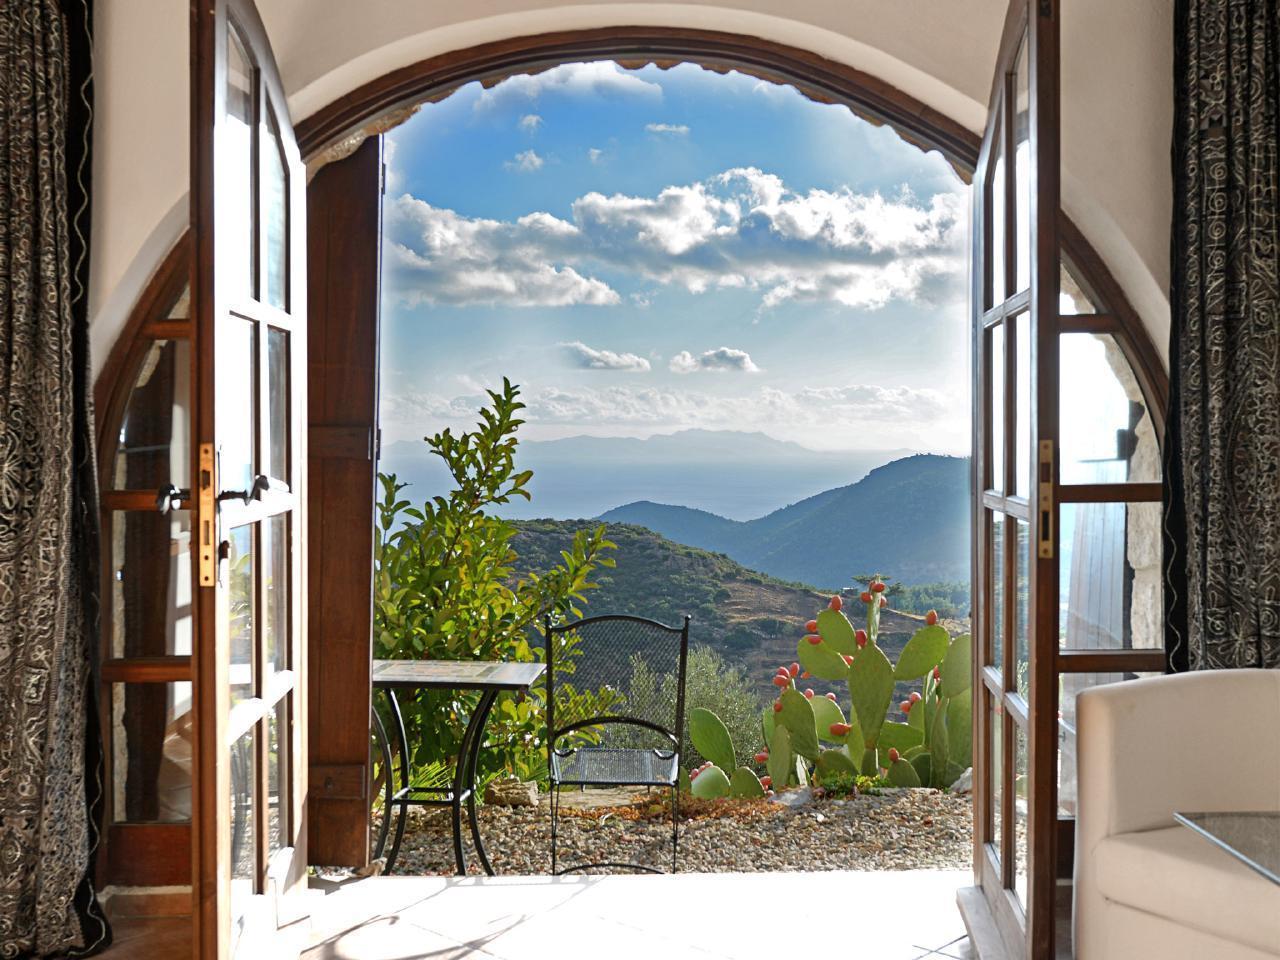 Maison de vacances Exklusives Chalet, romantisch am Berghang und Meer gelegen (2506674), Mesudiye, , Région Egéenne, Turquie, image 7